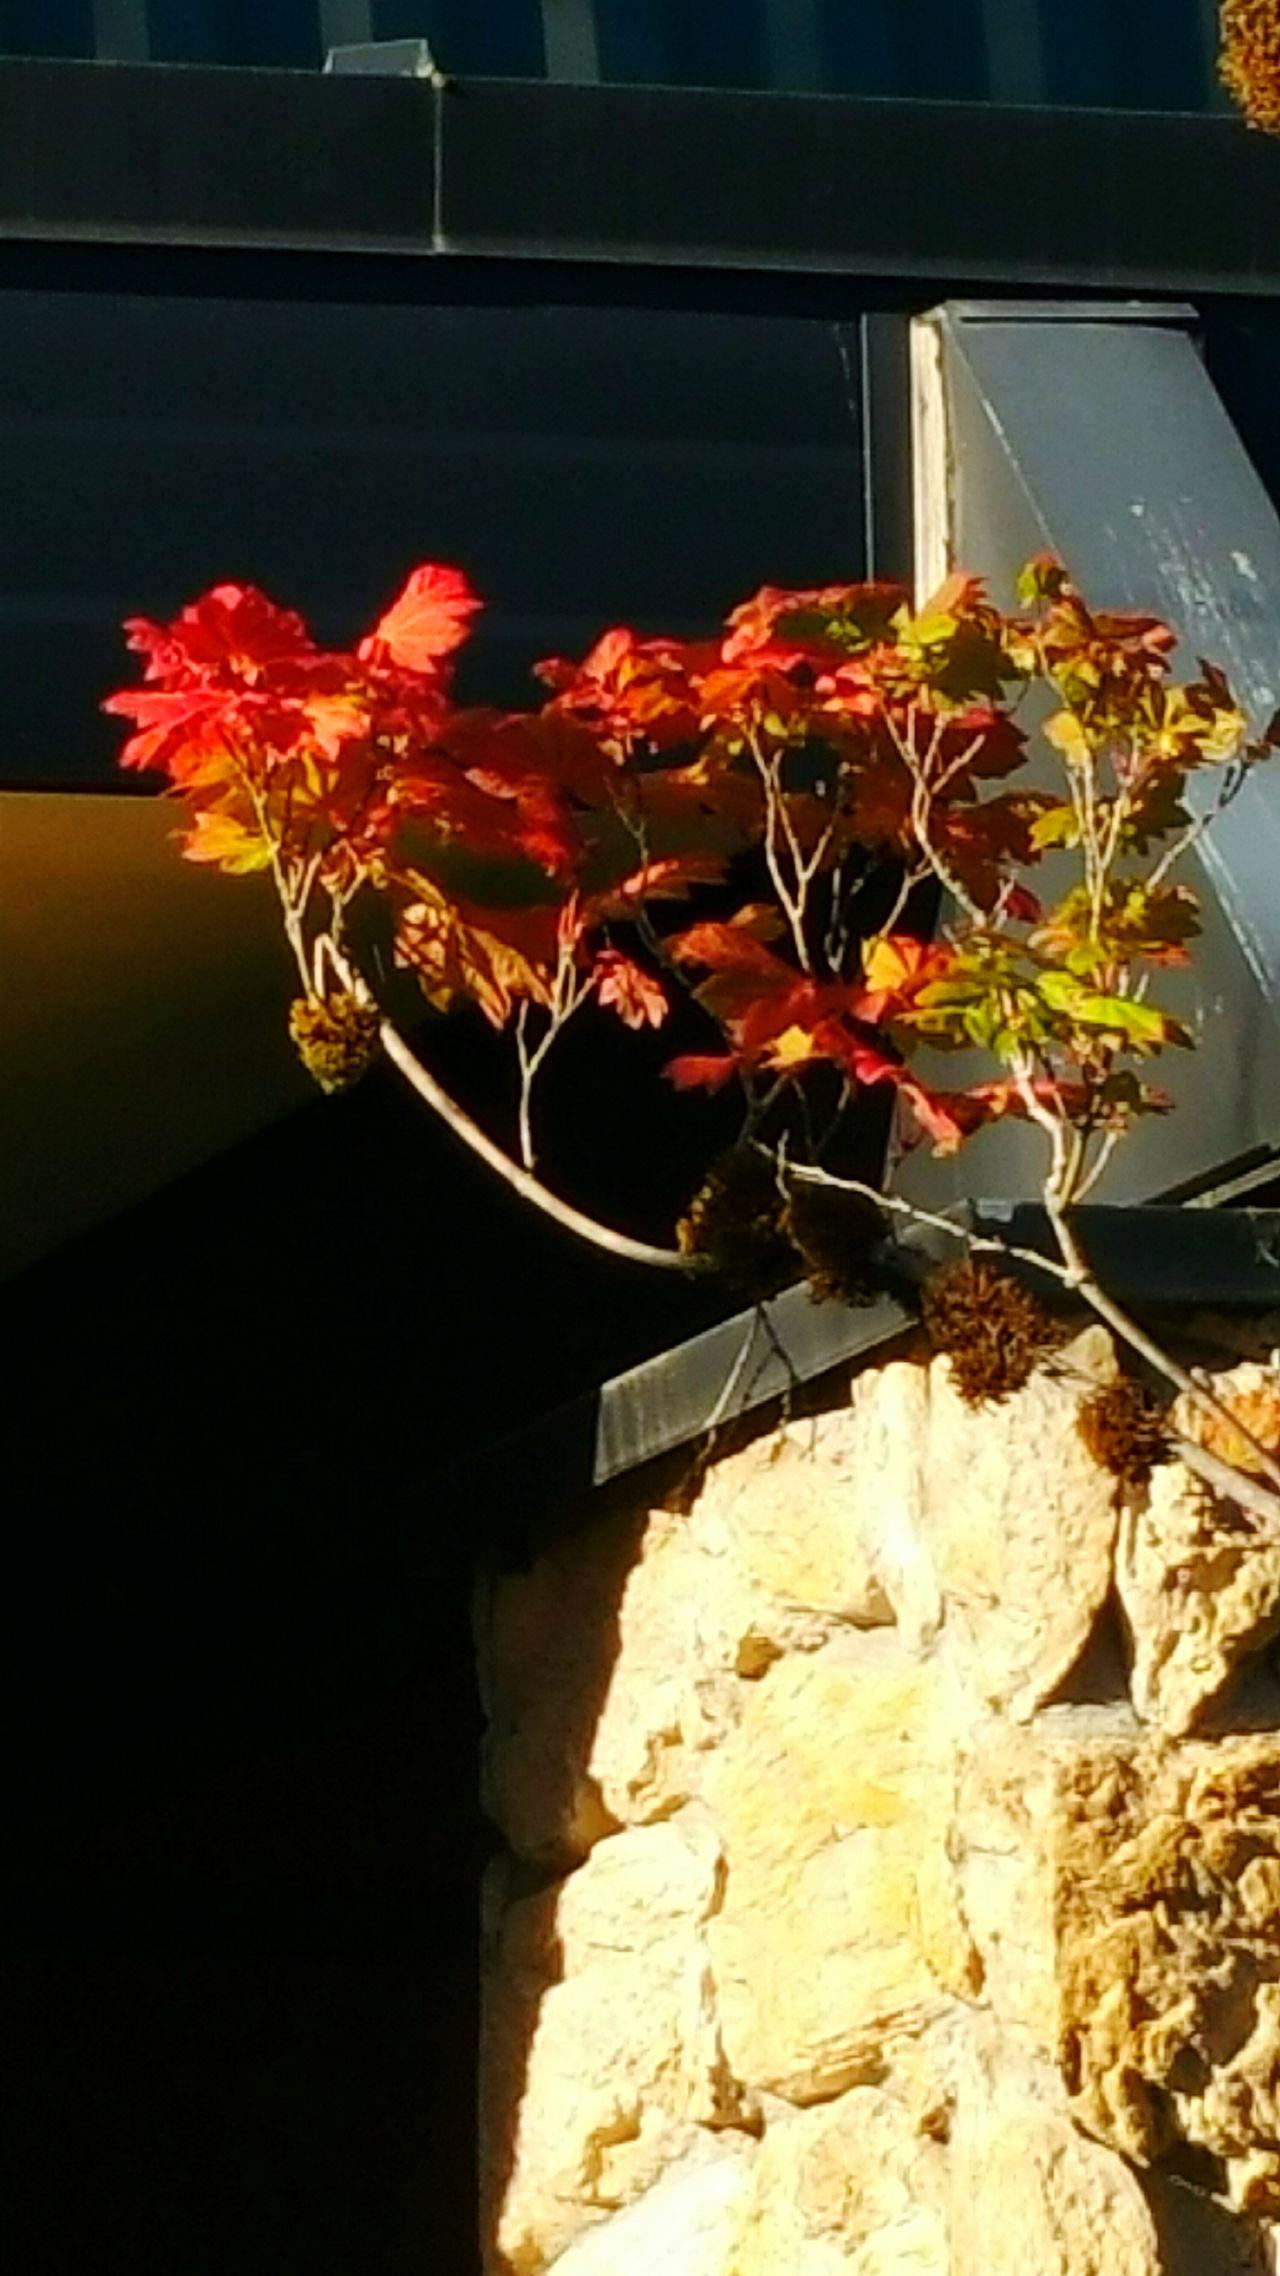 Beautiful Nature Autumn🍁🍁🍁 Fall Colors Colors Of Autumn Autumn Colors Leaves Are Falling Autumn Leaves Fall Is Coming! Fall Leaves Nature_collection